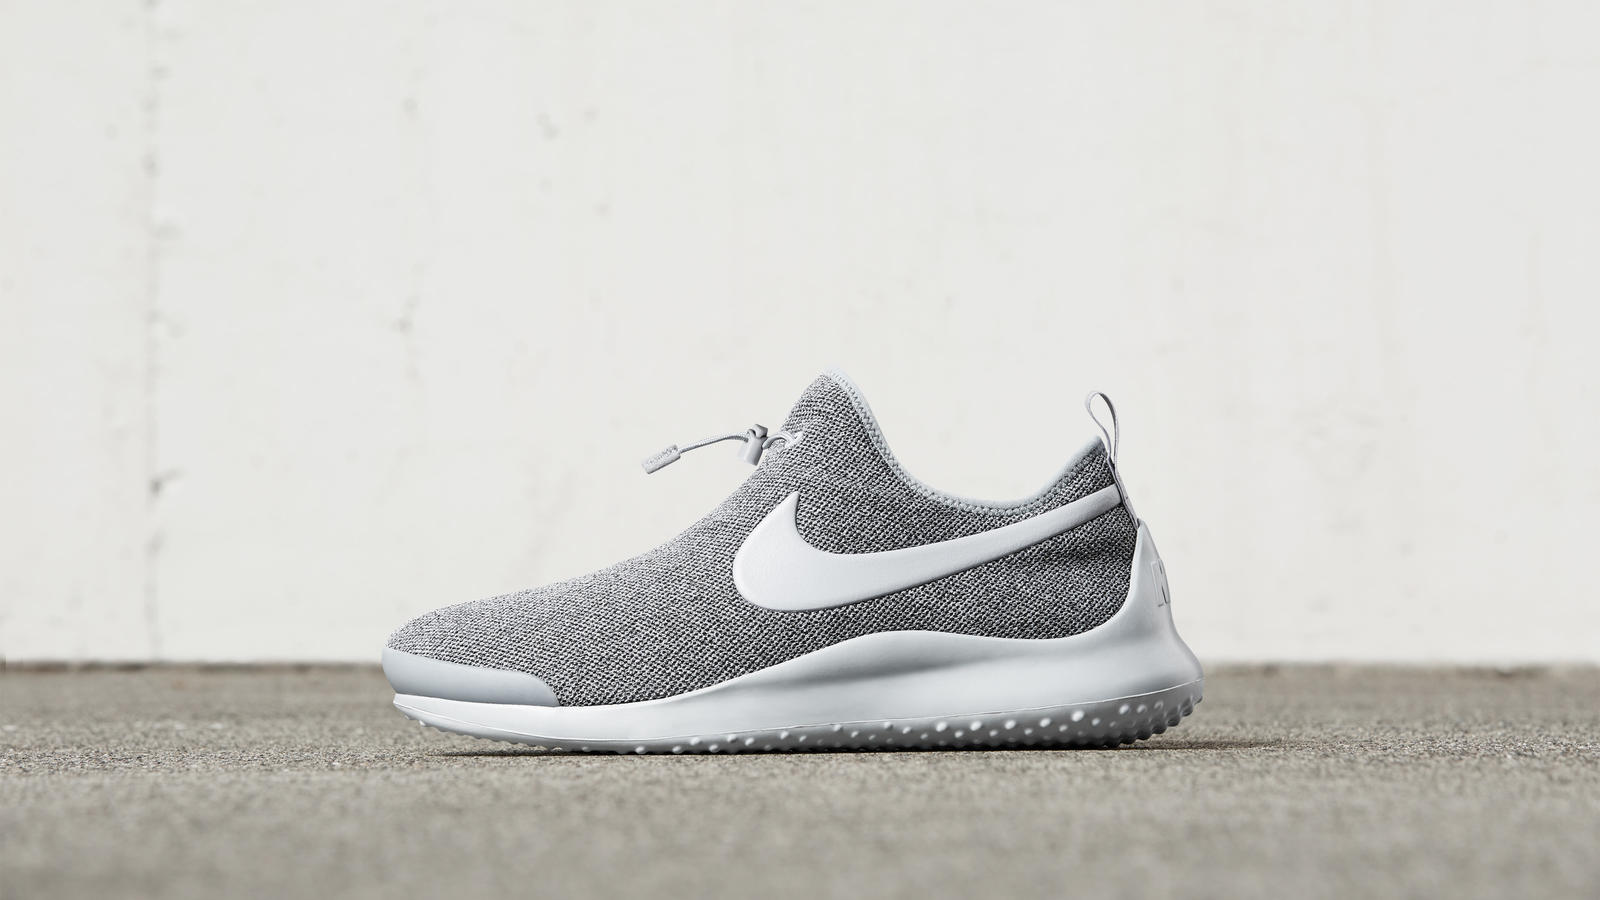 161129 footwear project x 0038r hd 1600